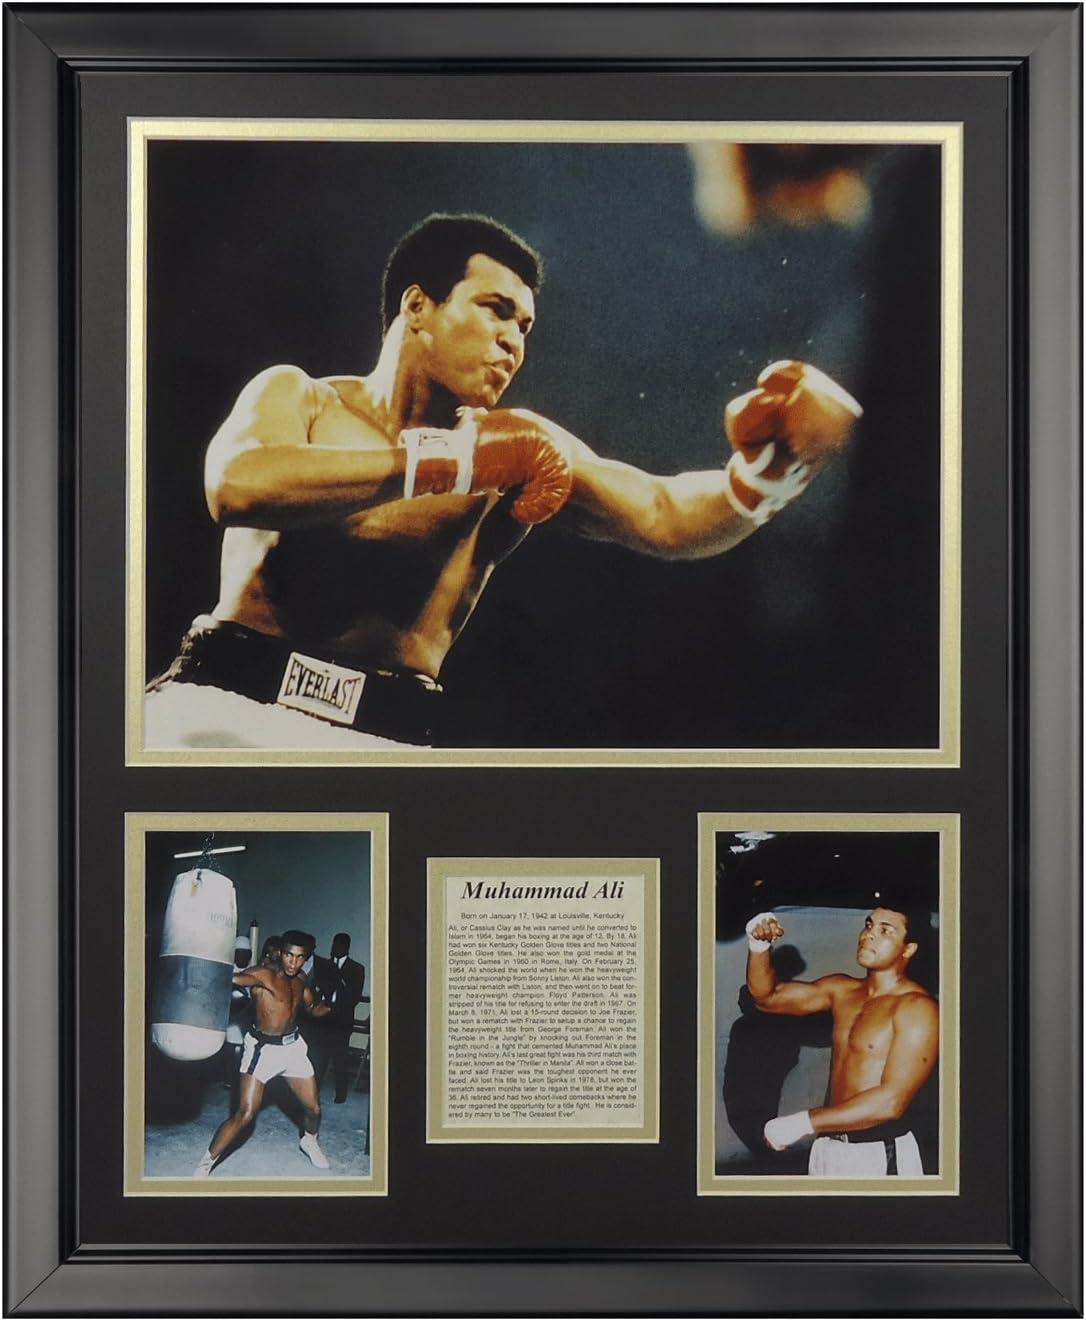 16 x 20 Legends Never Die Muhammad Ali Framed Photo Collage